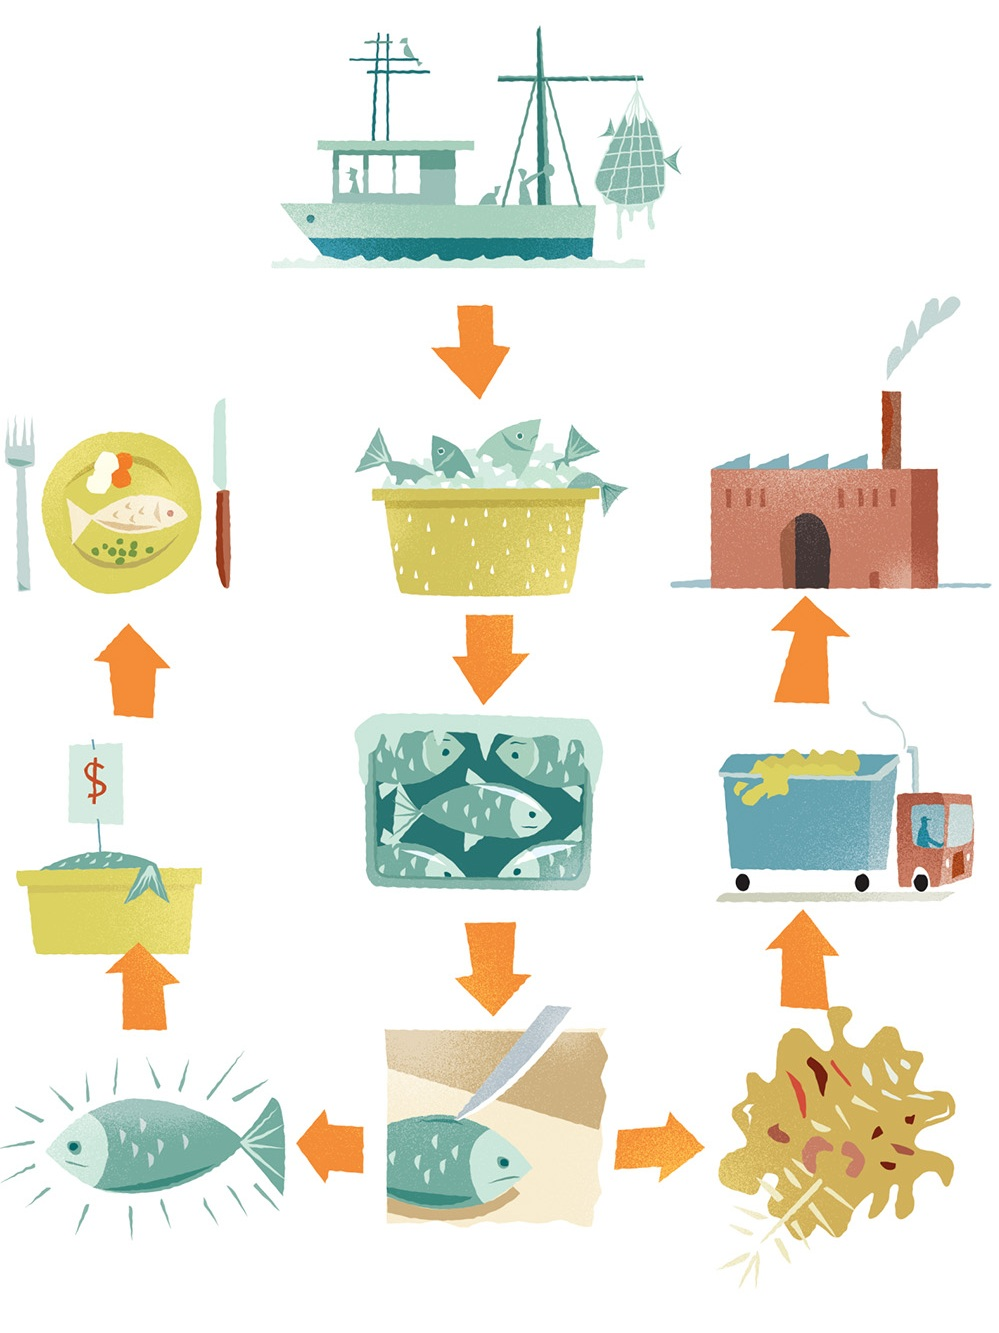 Fishing Industry process chart illustration-Dean Gorissen.jpg